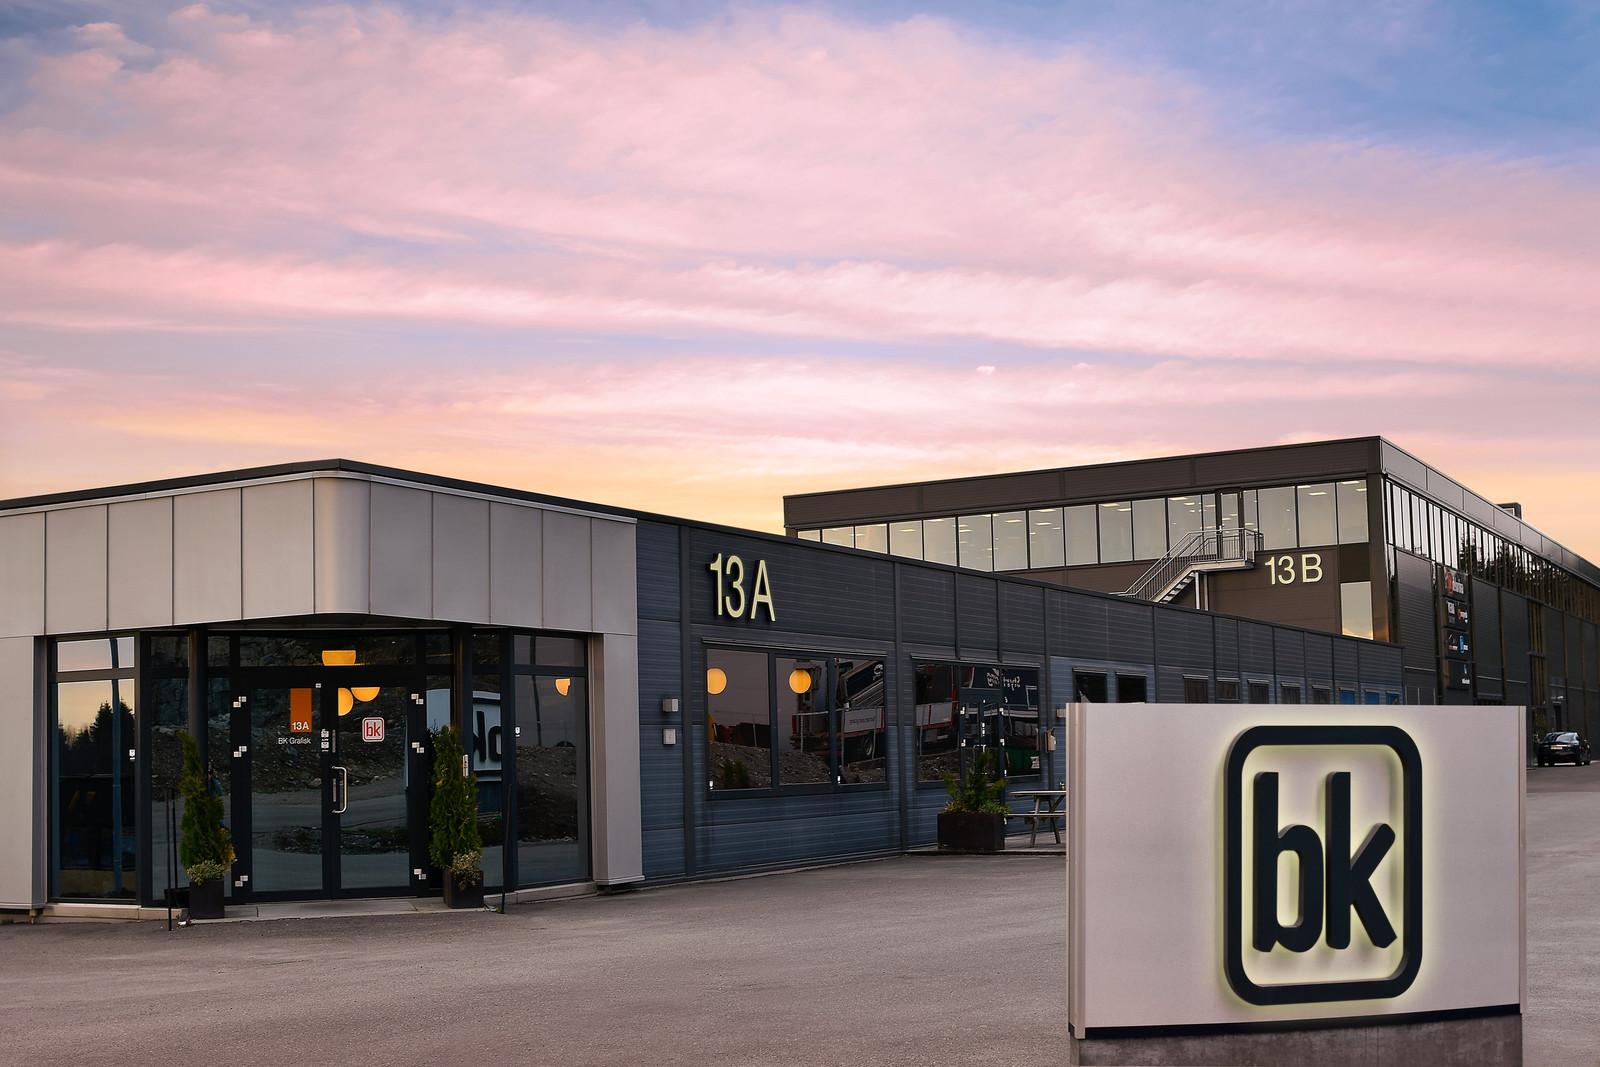 BK kontorbygg fasade